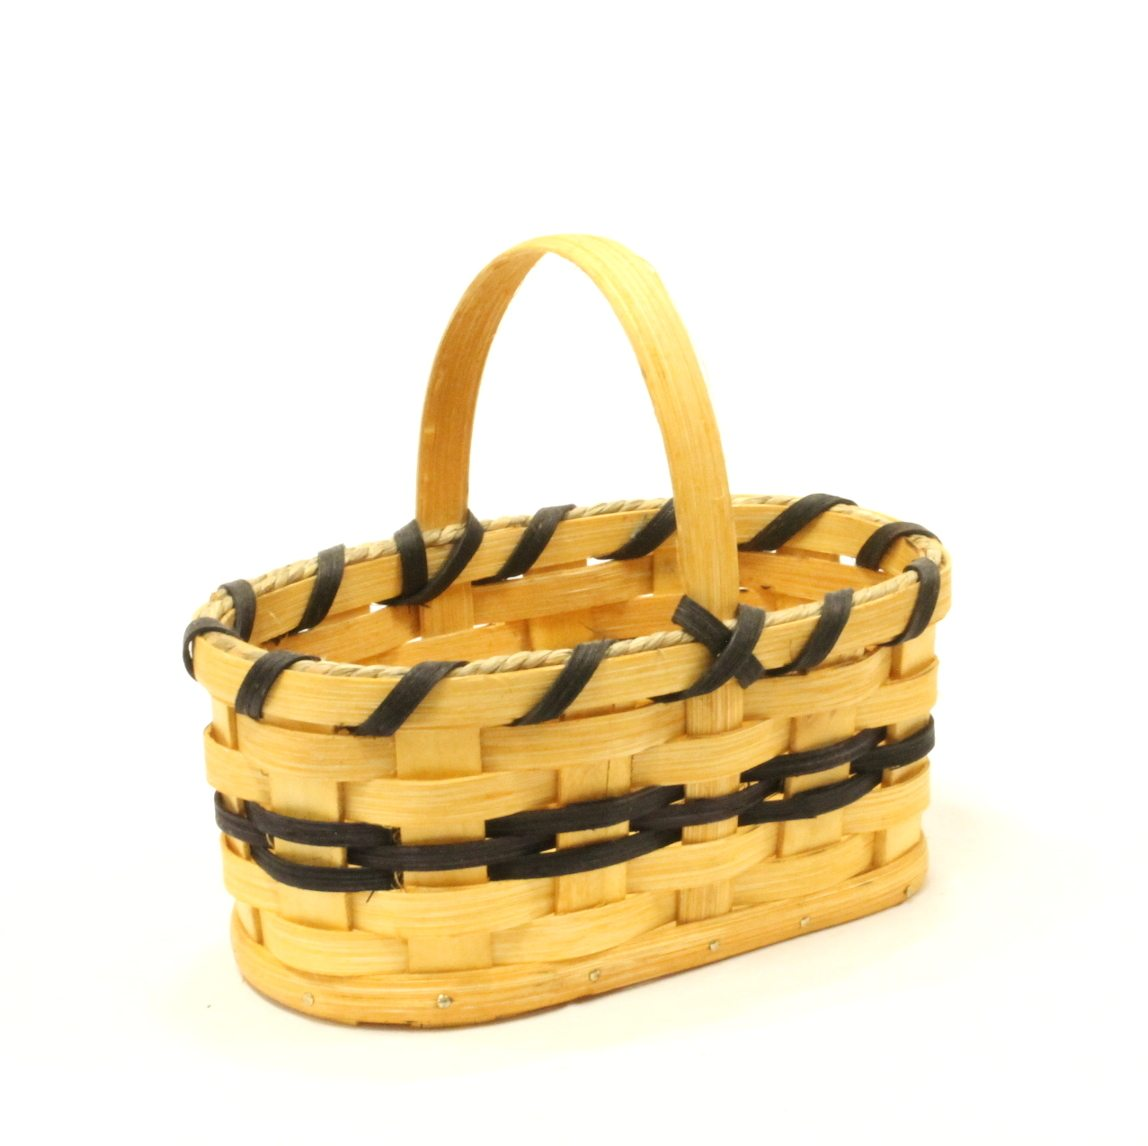 Creamer basket with handle